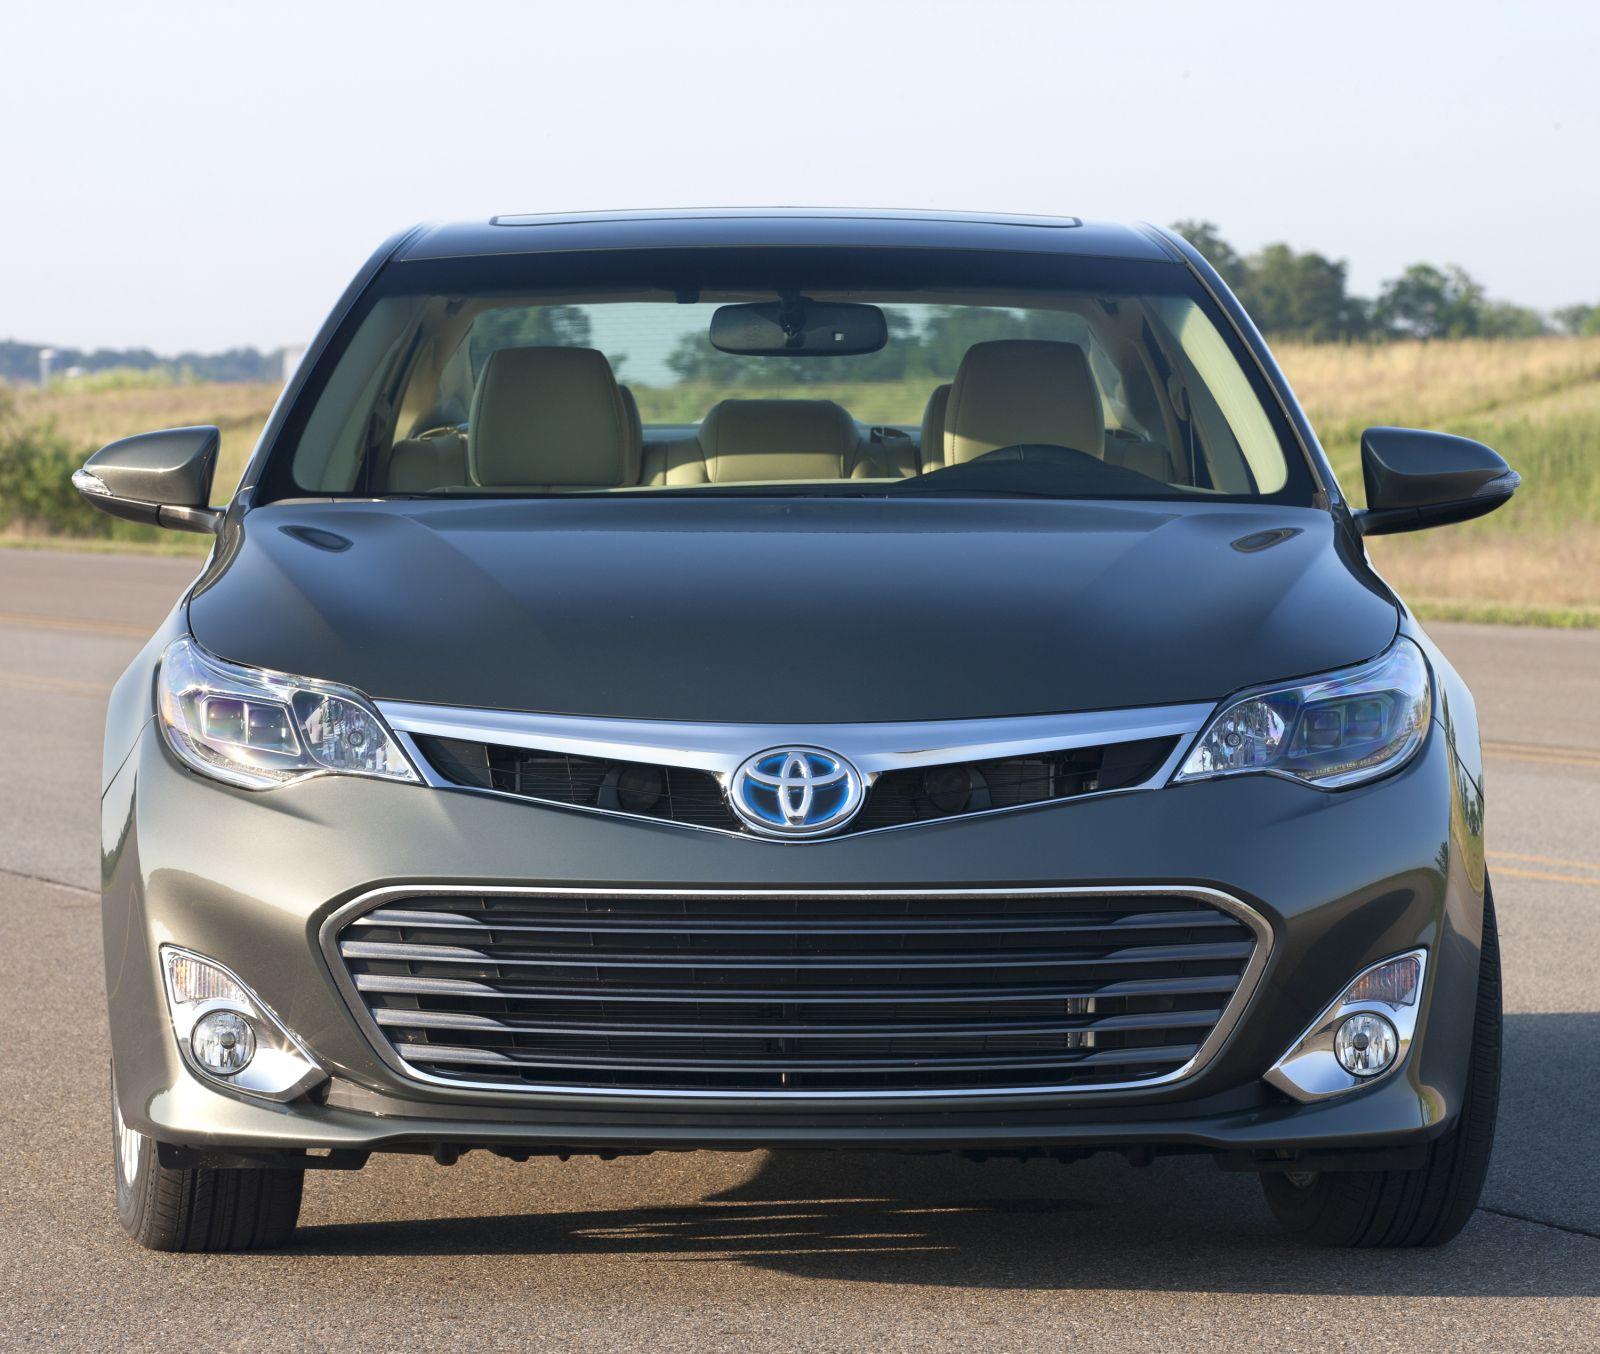 2013 Toyota Avalon Exterior: Daily Cars: All-New 2013 Toyota Avalon